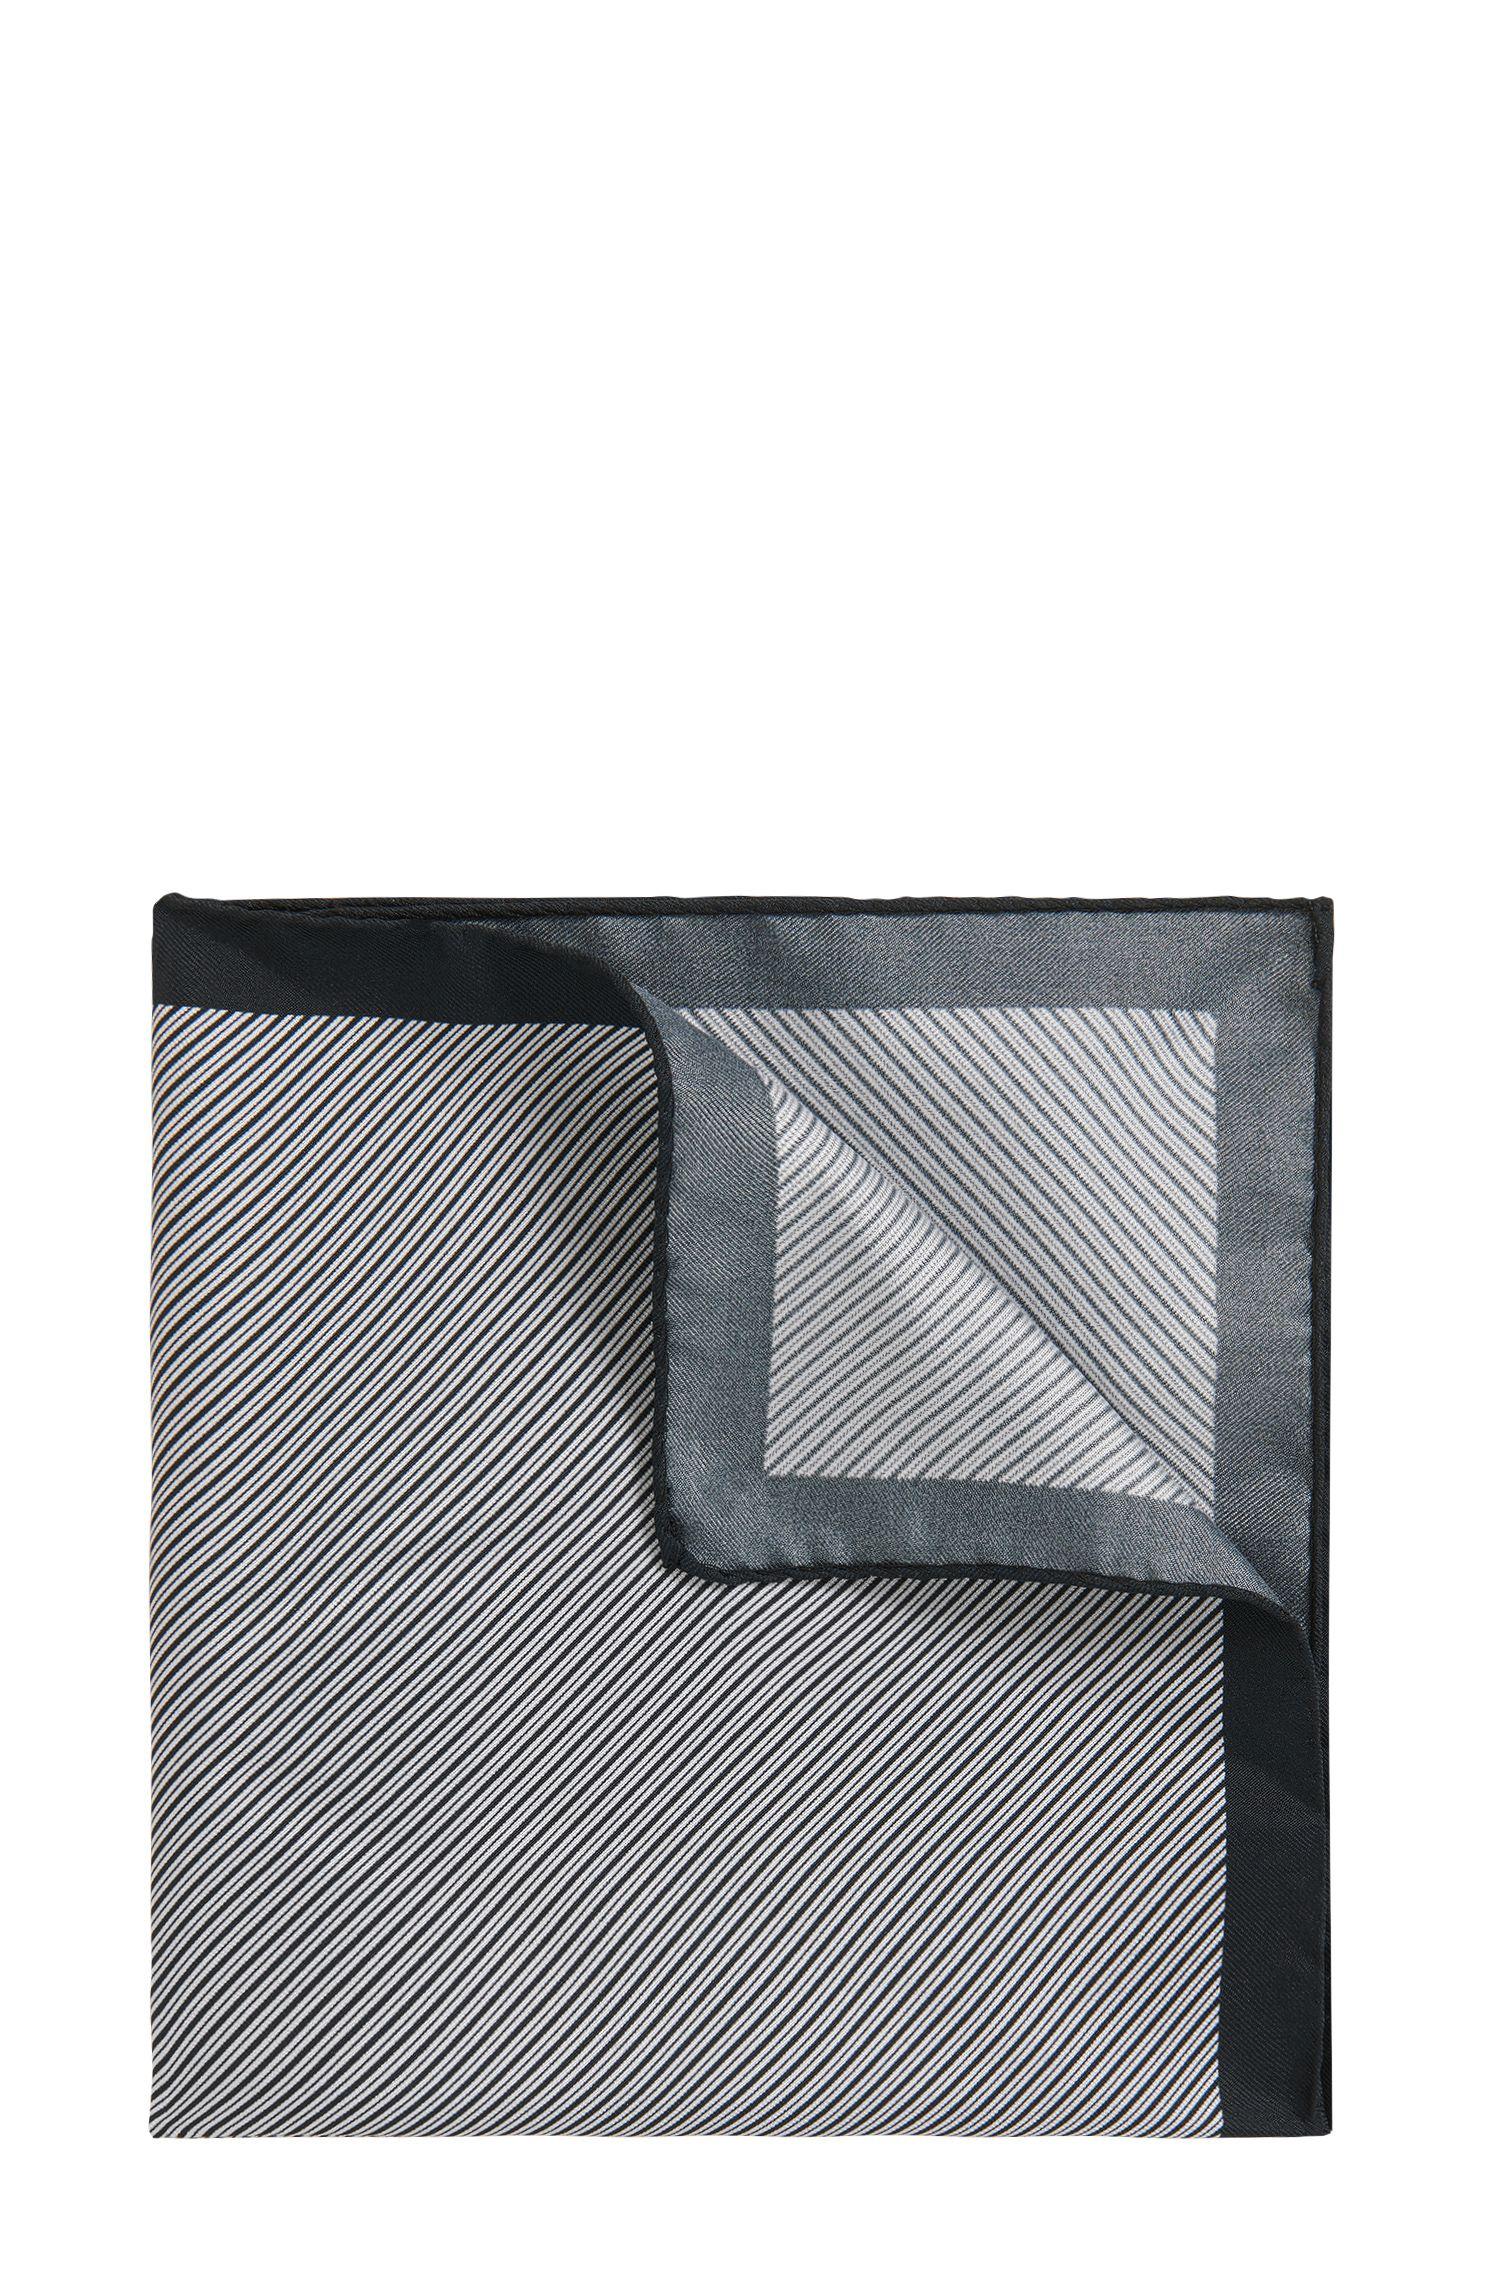 Pañuelo de bolsillo de seda con rayas diagonales